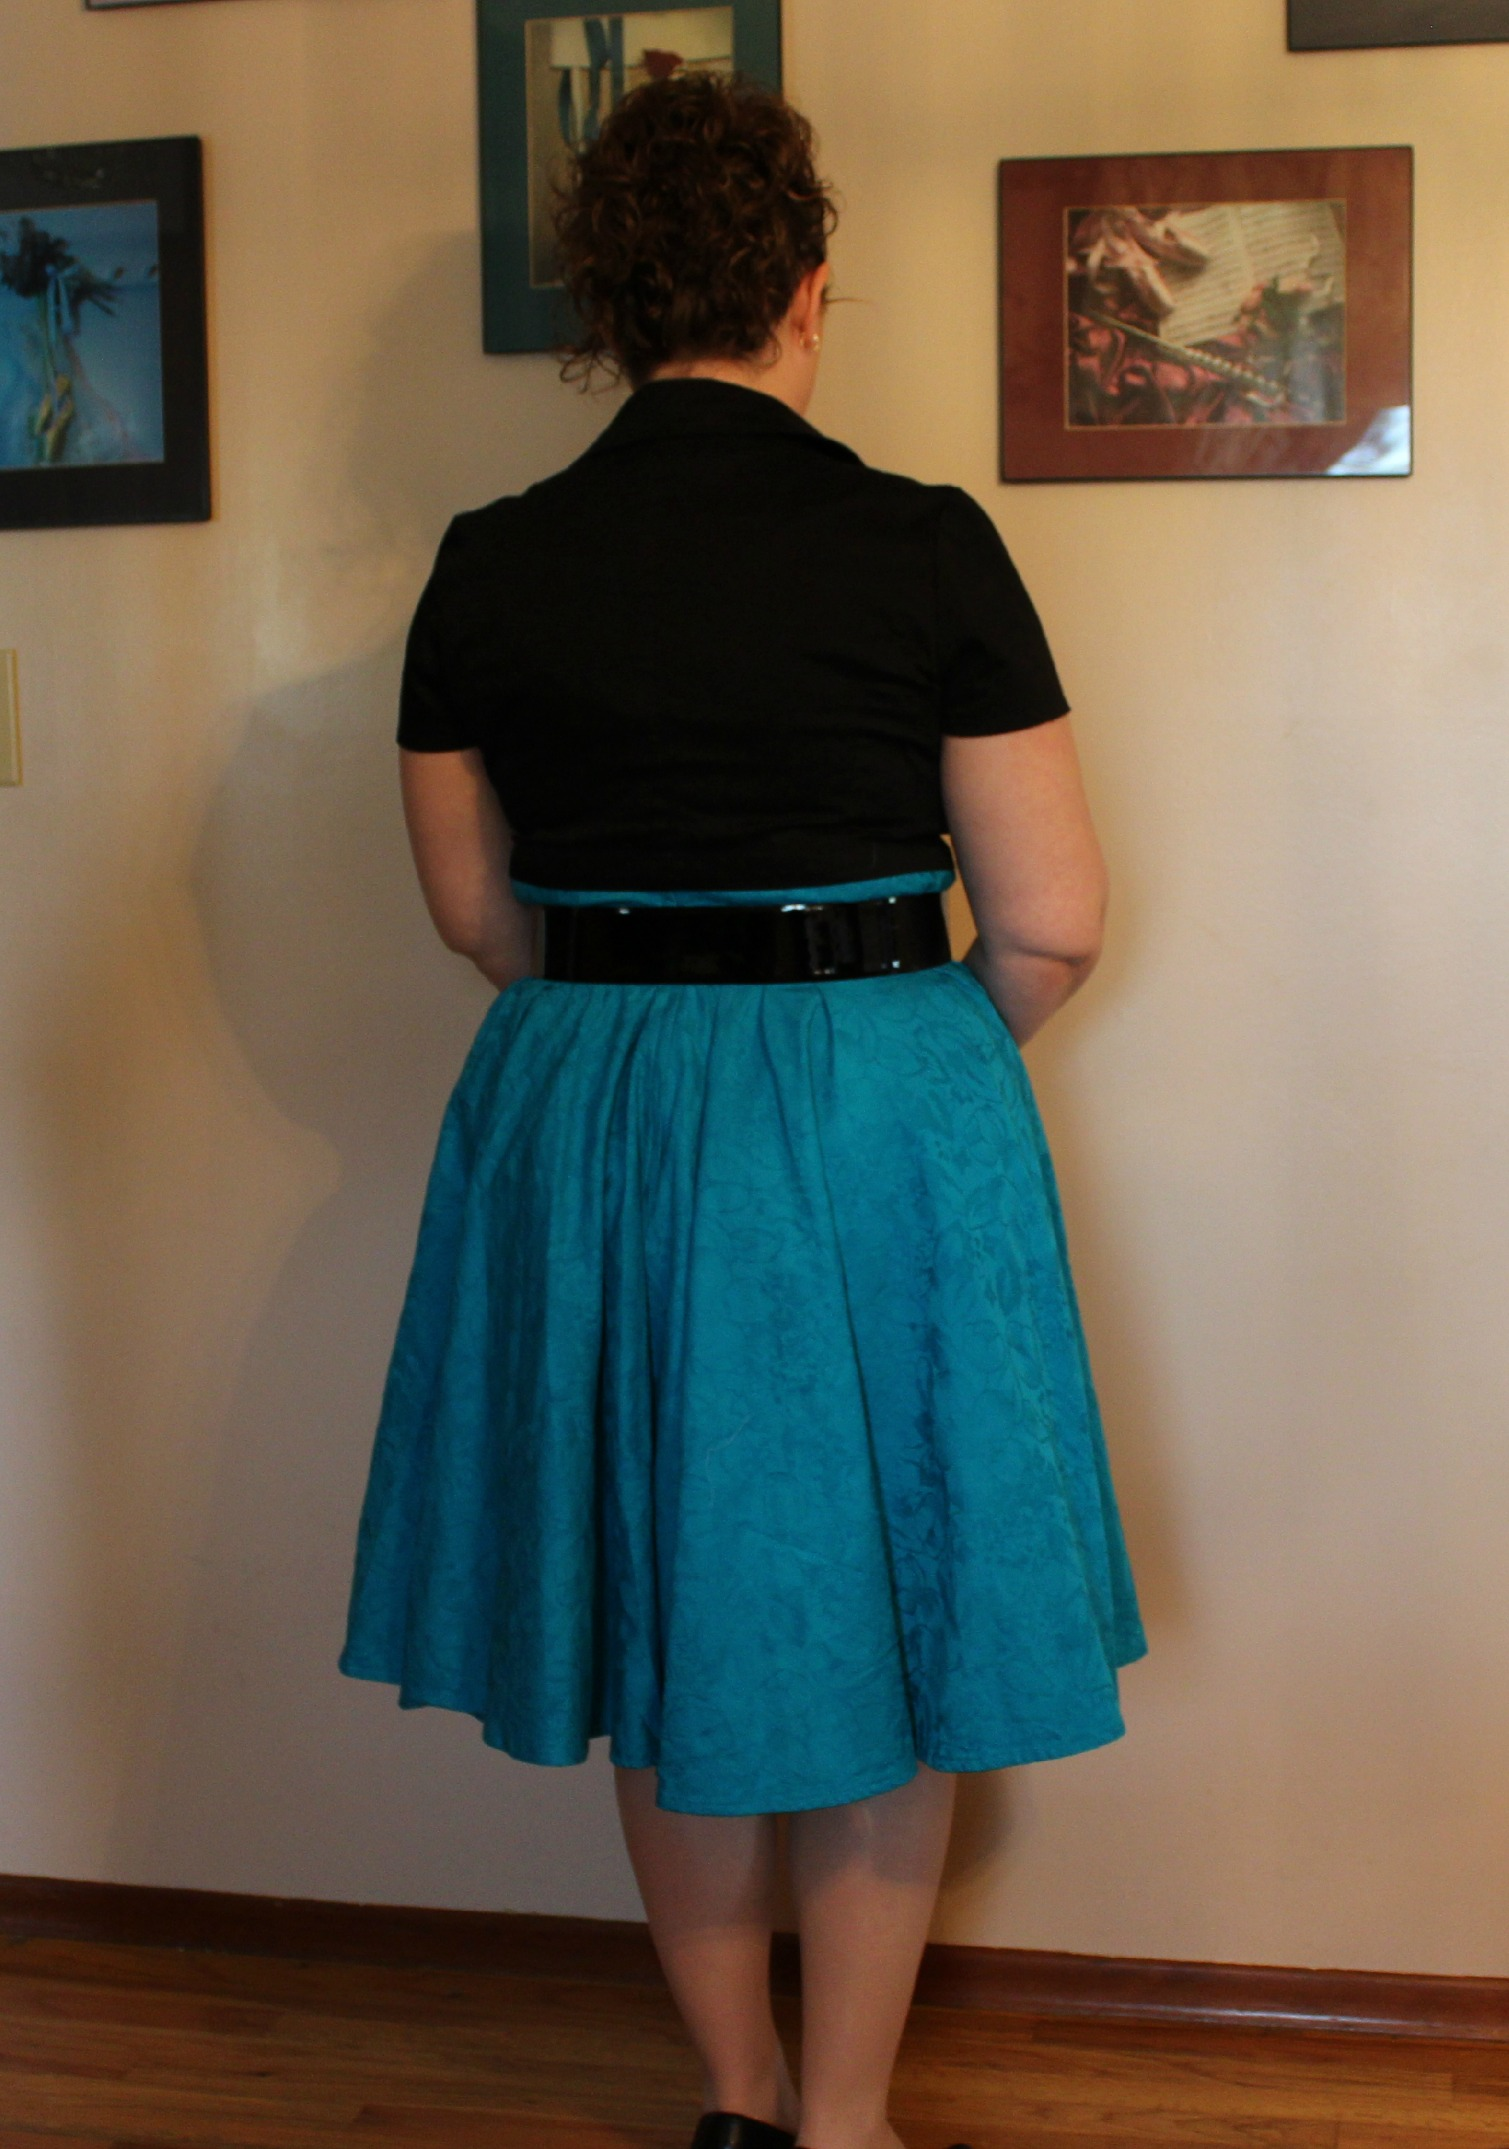 60's dress back